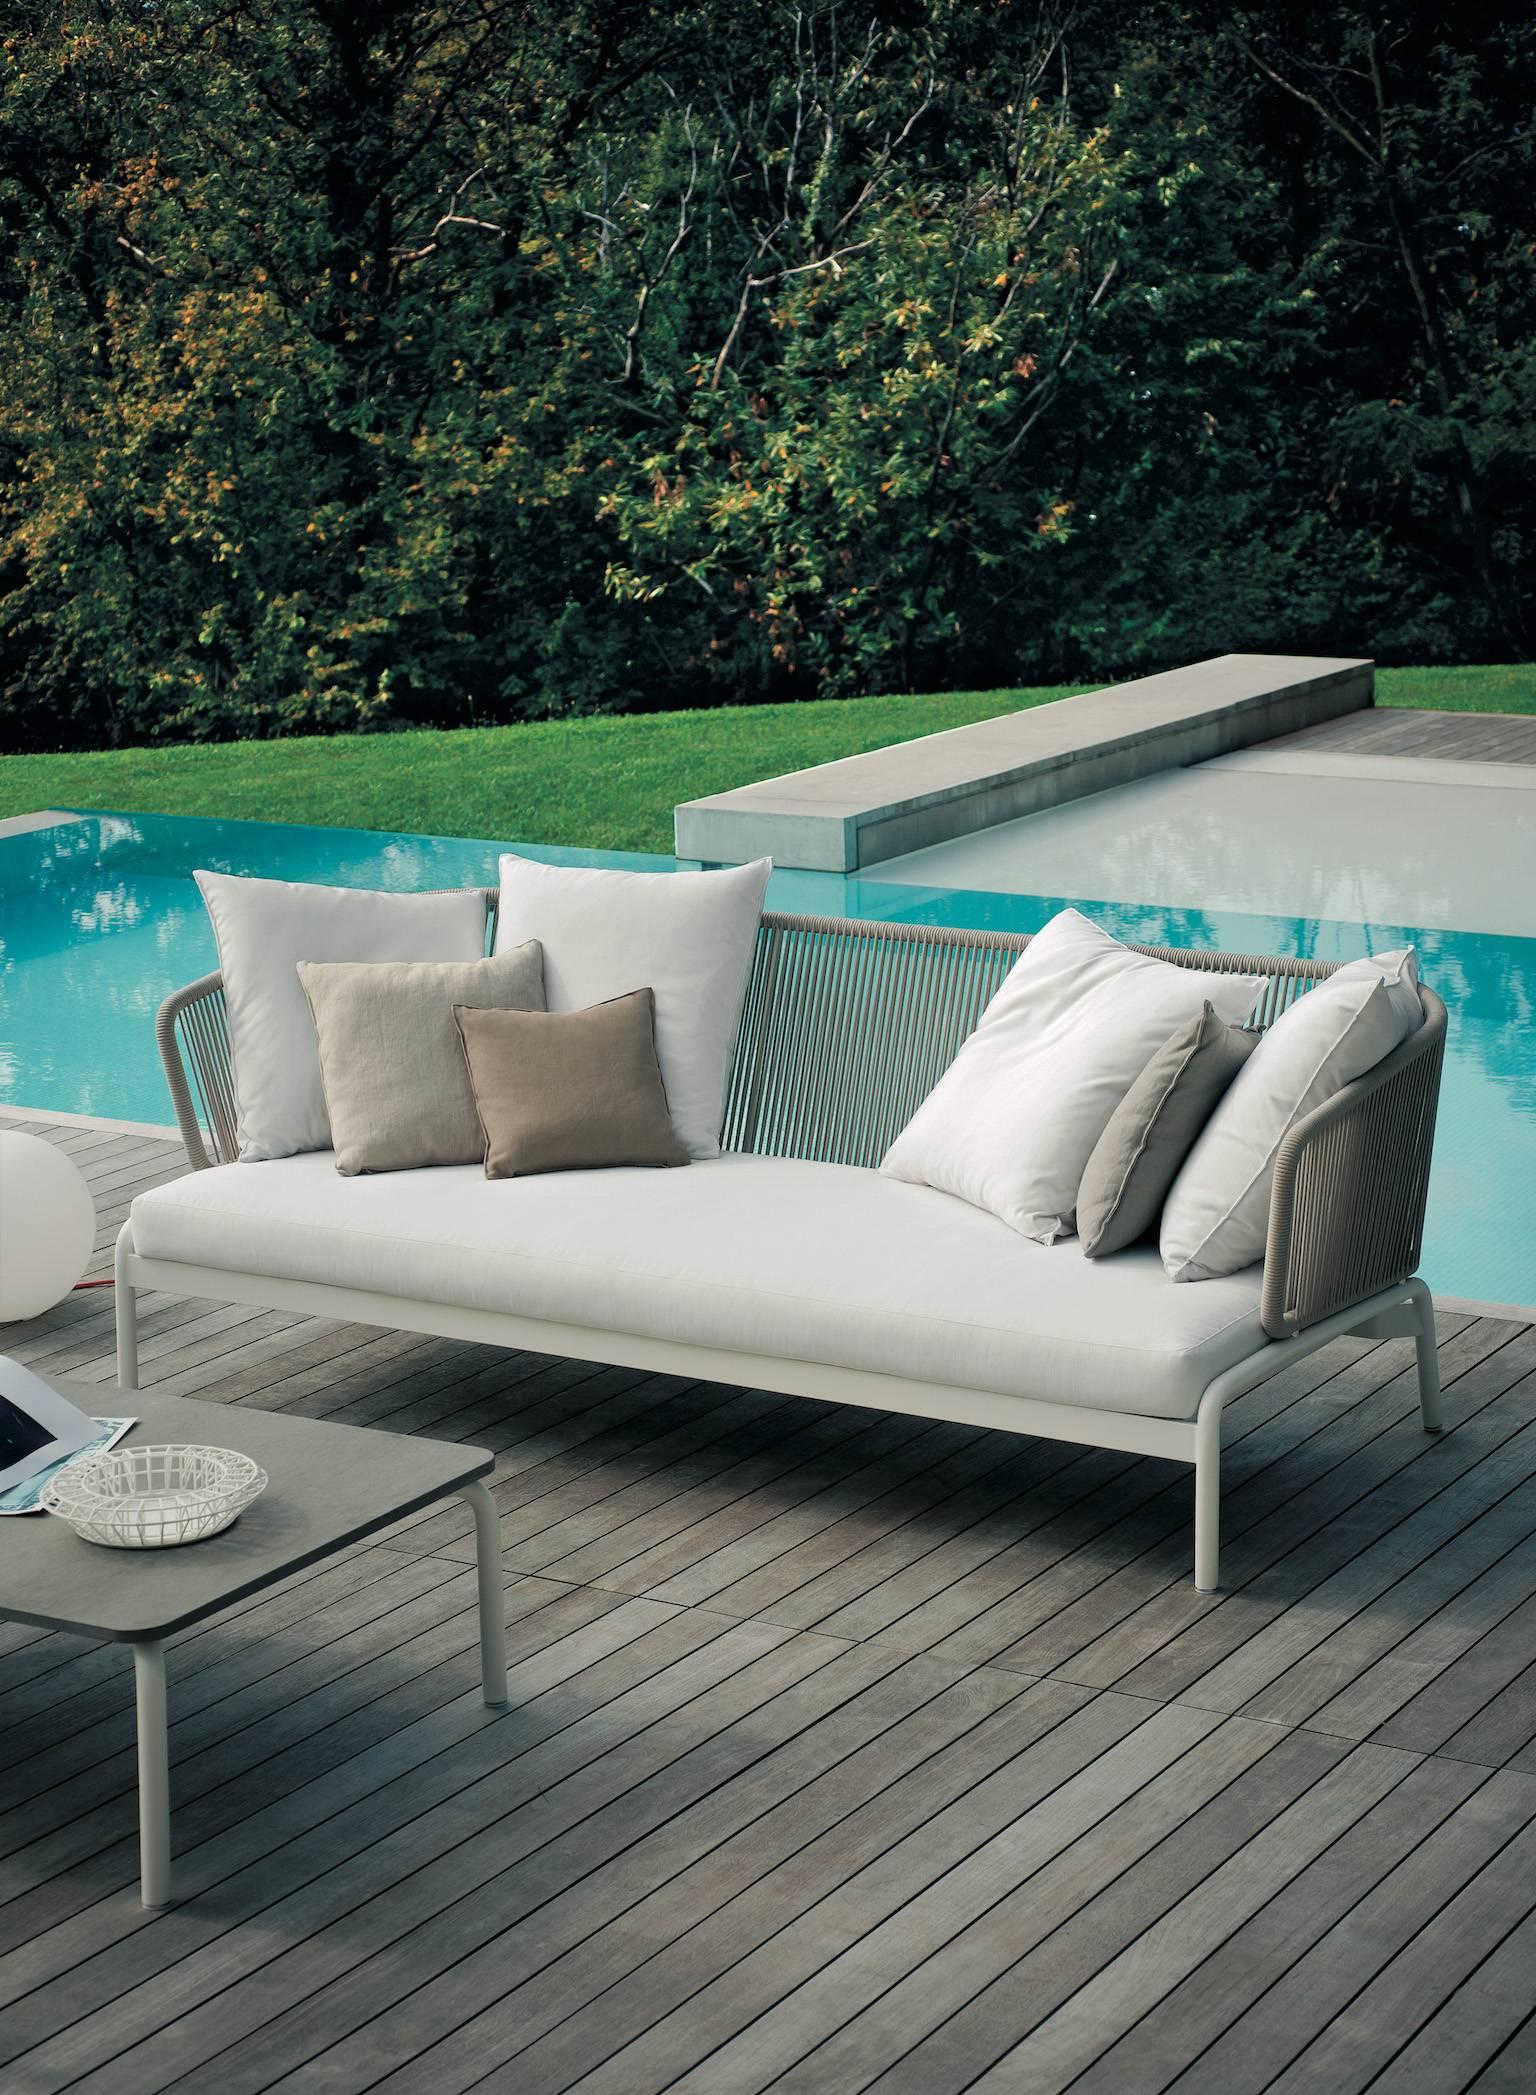 RODA Spool three-Seat Sofa for Outdoor/Indoor Use by Rodolfo Dordoni For  Sale at 1stdibs - RODA Spool Three-Seat Sofa For Outdoor/Indoor Use By Rodolfo Dordoni